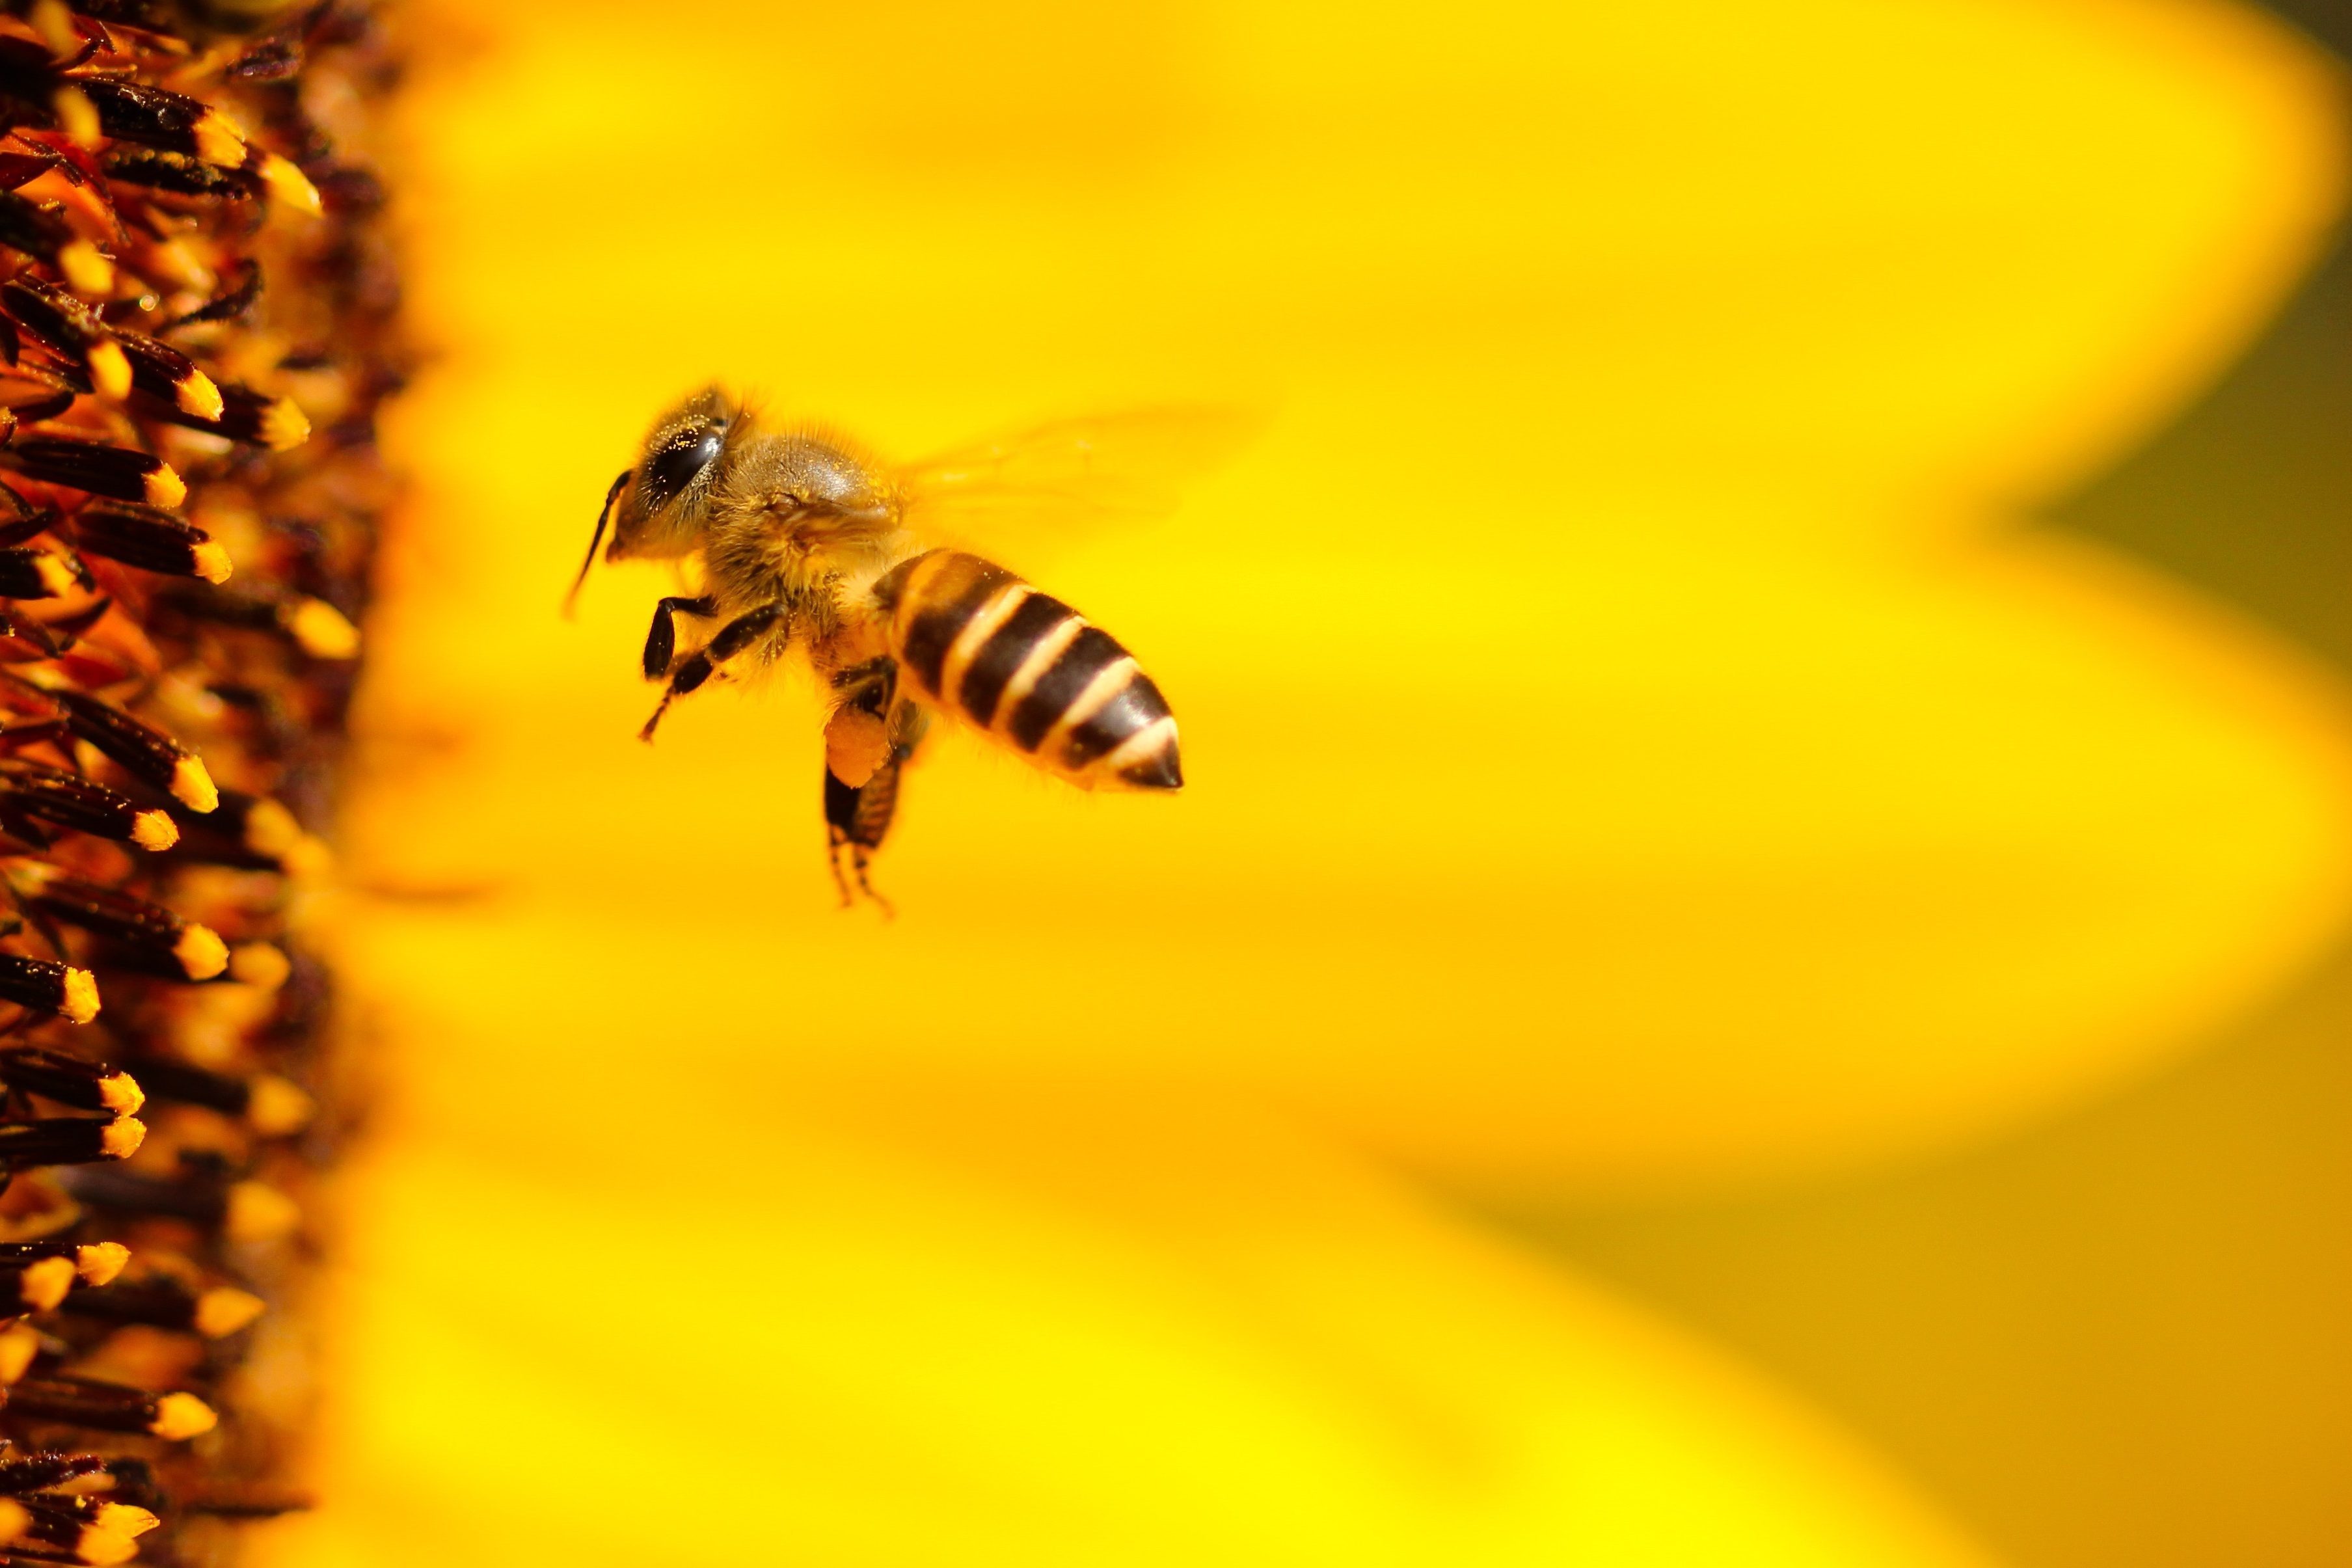 Désinsectisation abeille